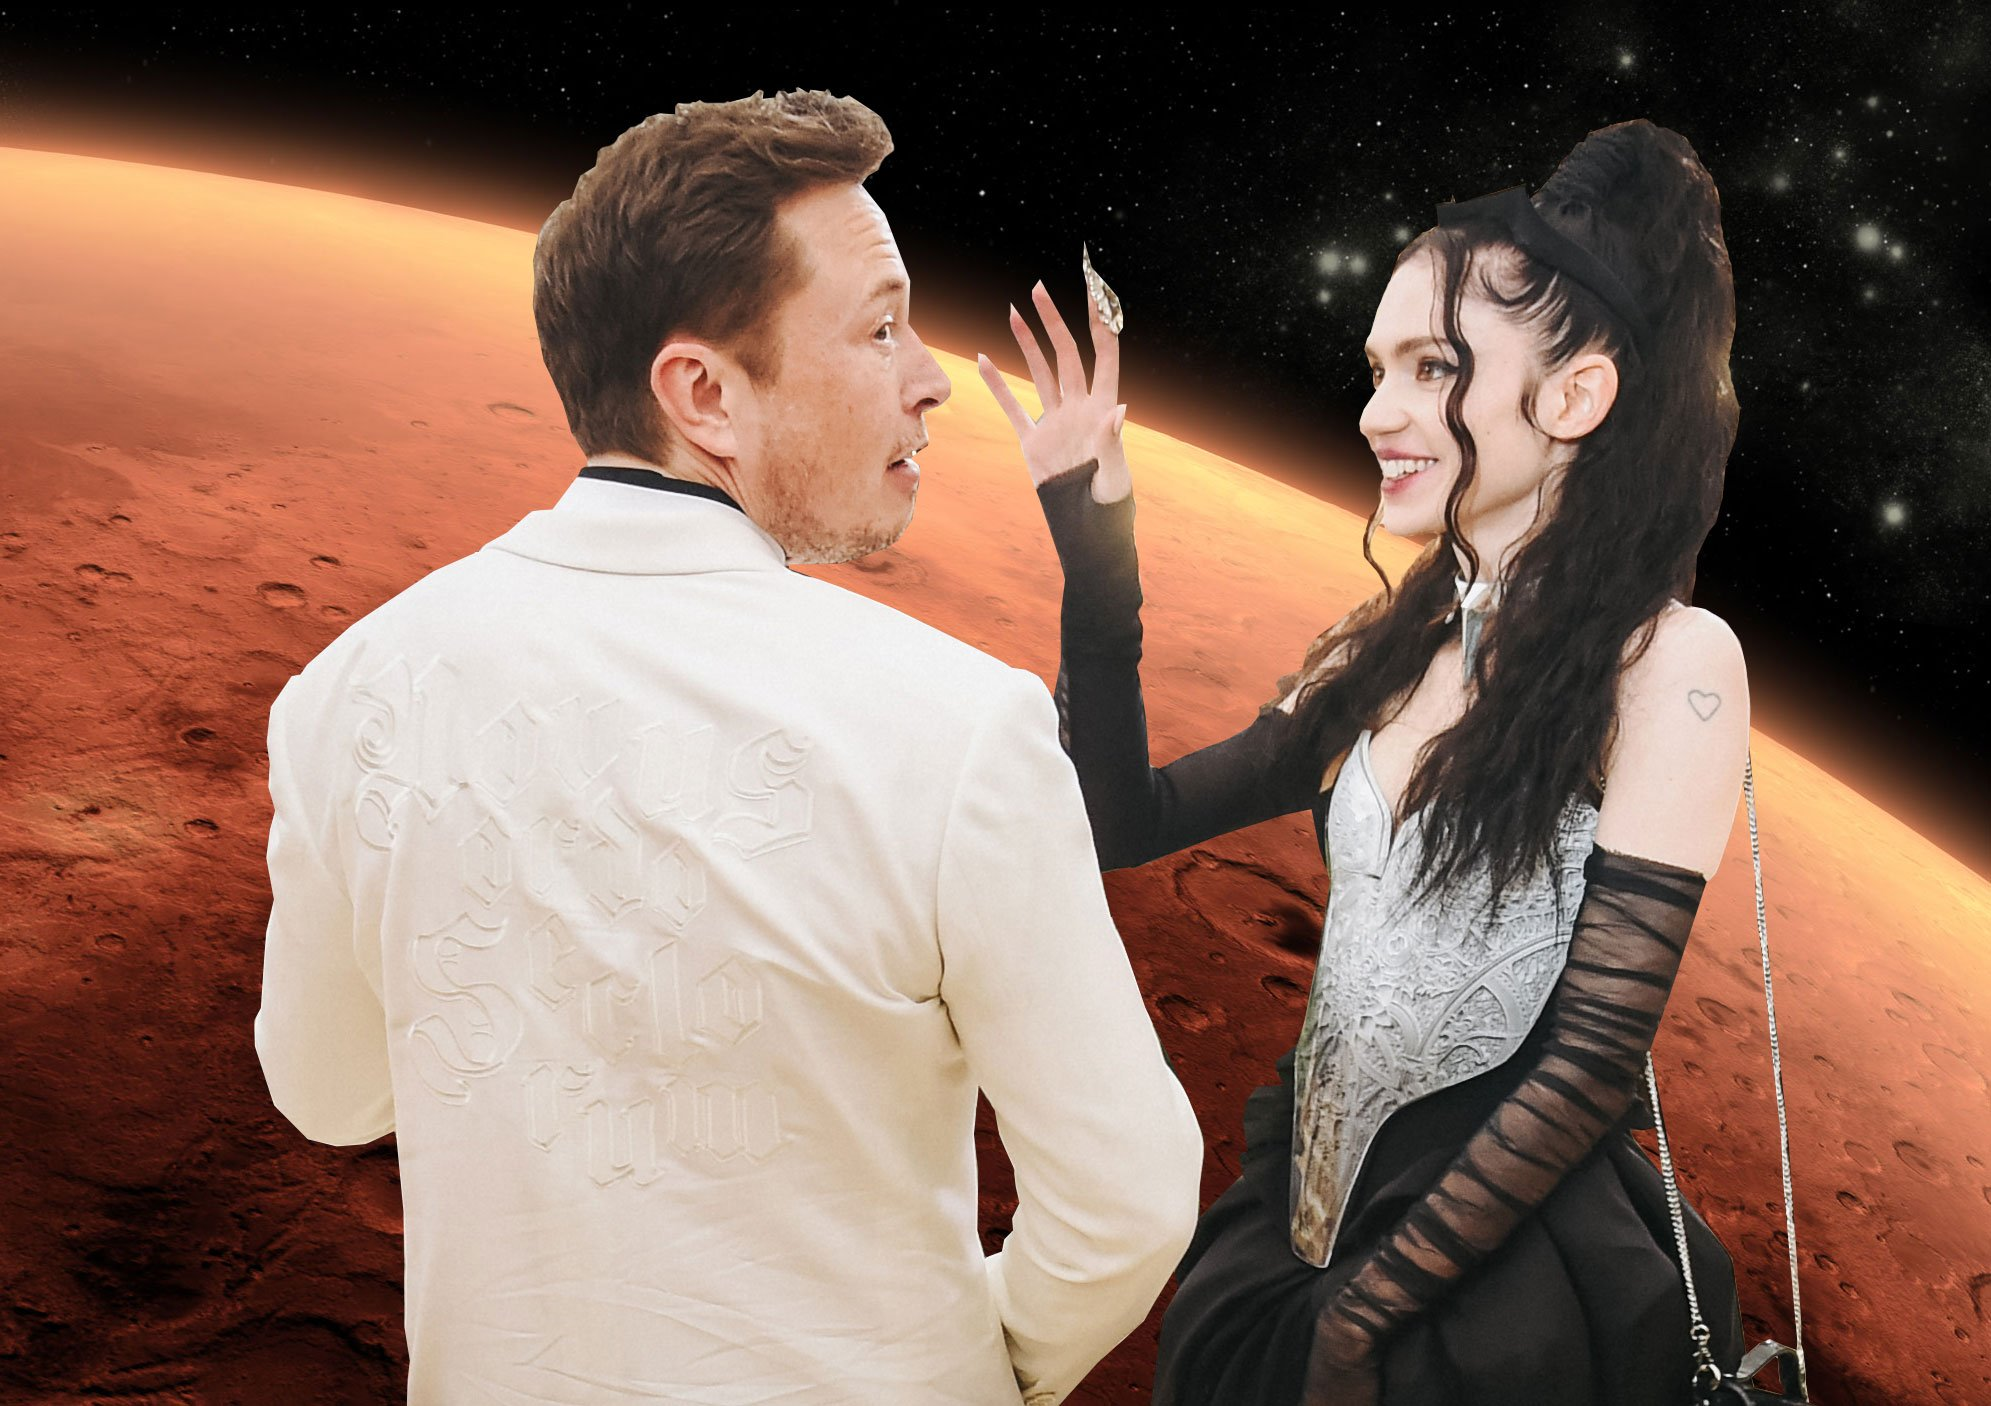 The week Grimes and Elon Musk broke the internet: a deep dive https://t.co/l2xKAP03rH https://t.co/EBIxg6UvzN